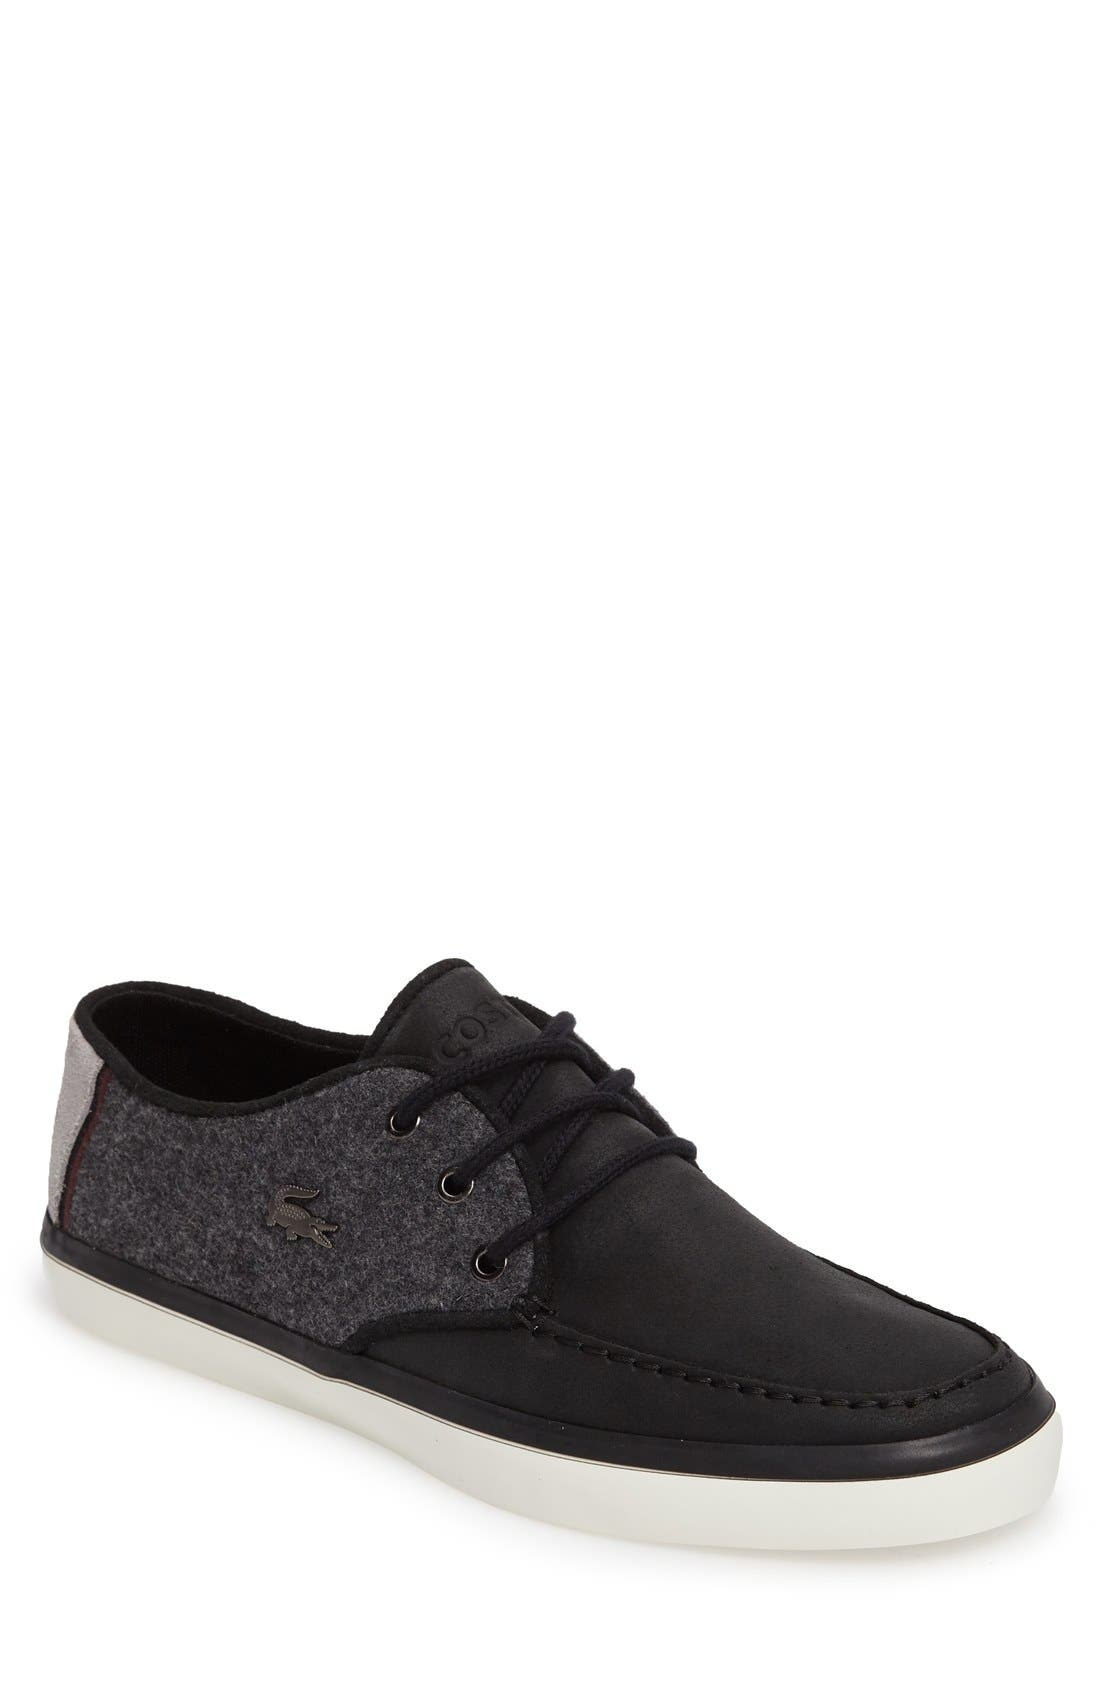 Main Image - Lacoste 'Sevrin 1161' Sneaker (Men)